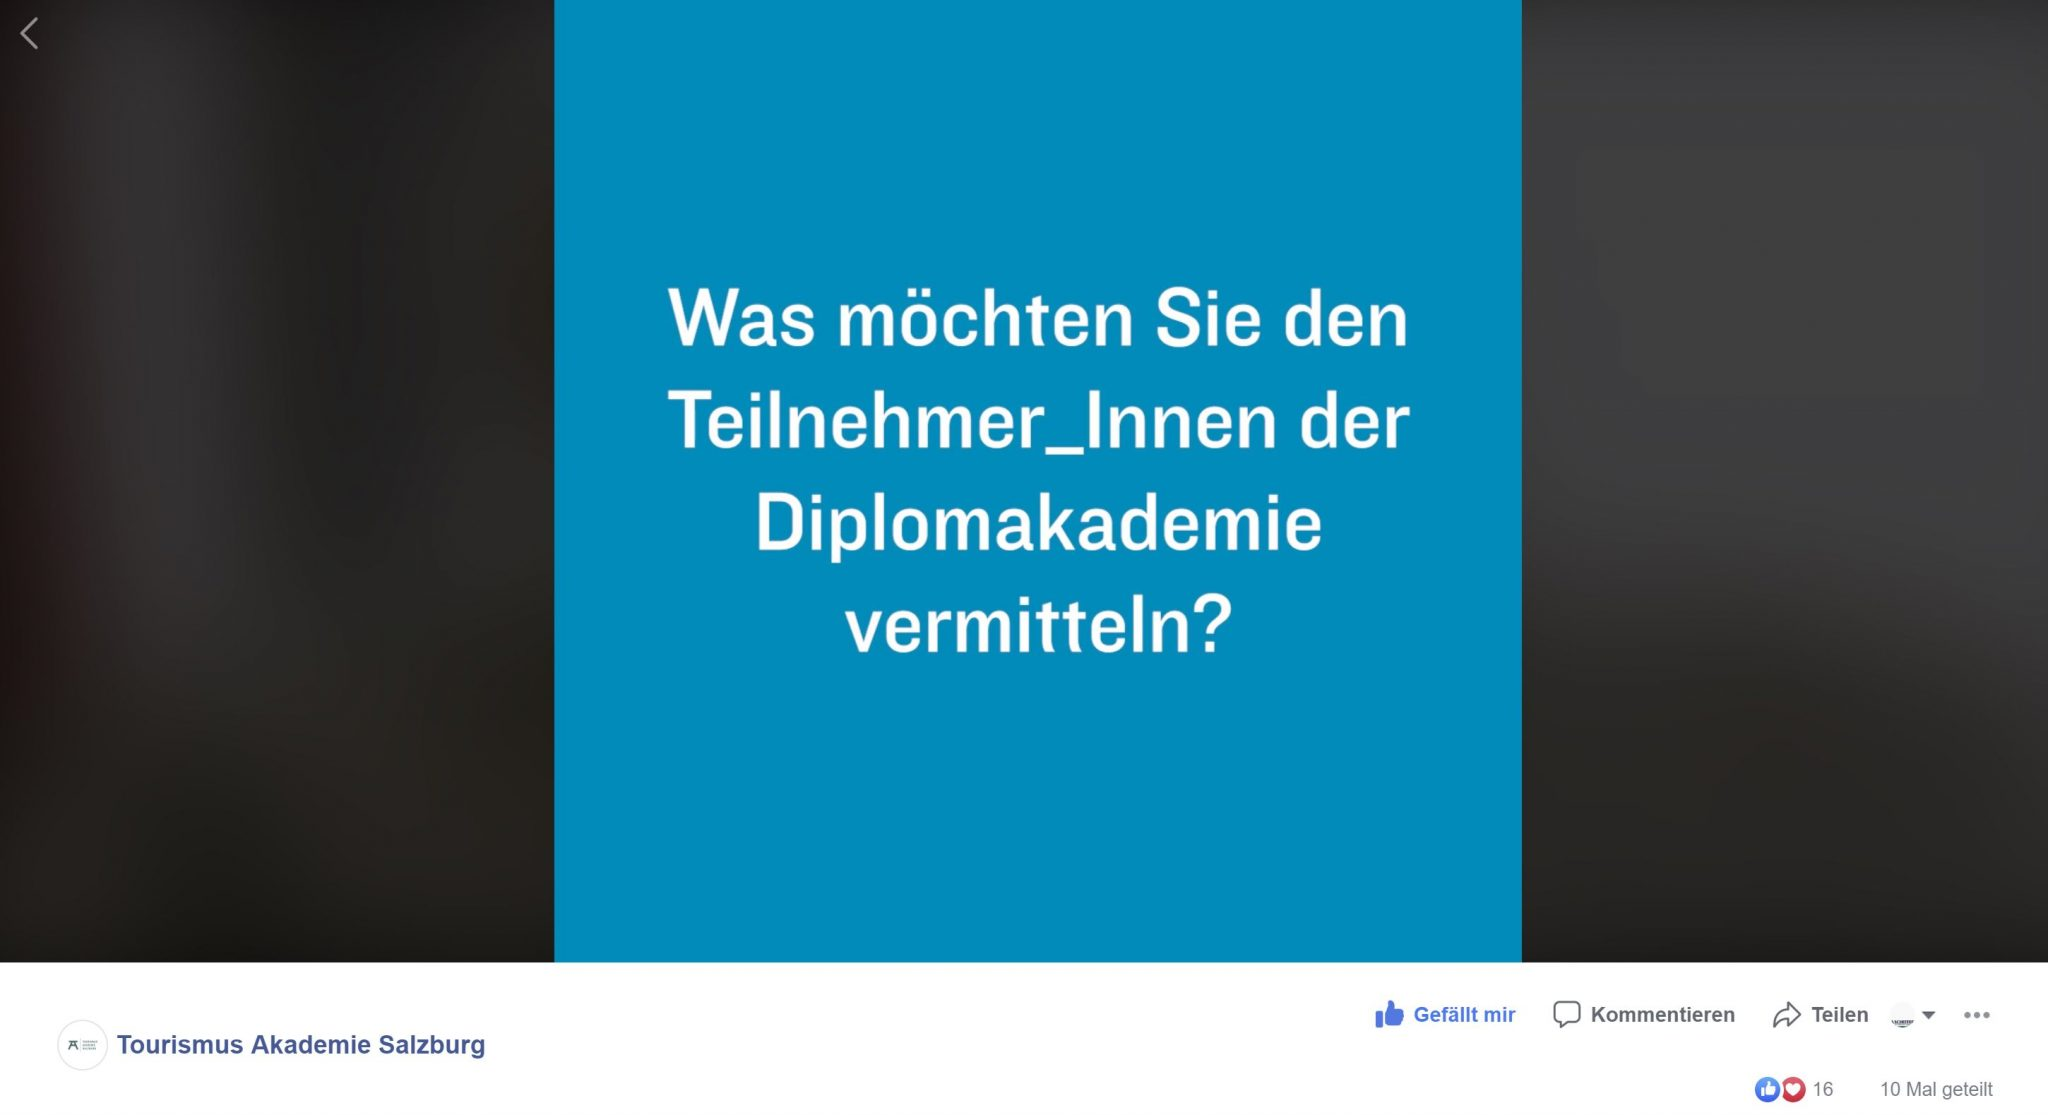 Video Tourismus Akademie Salzburg